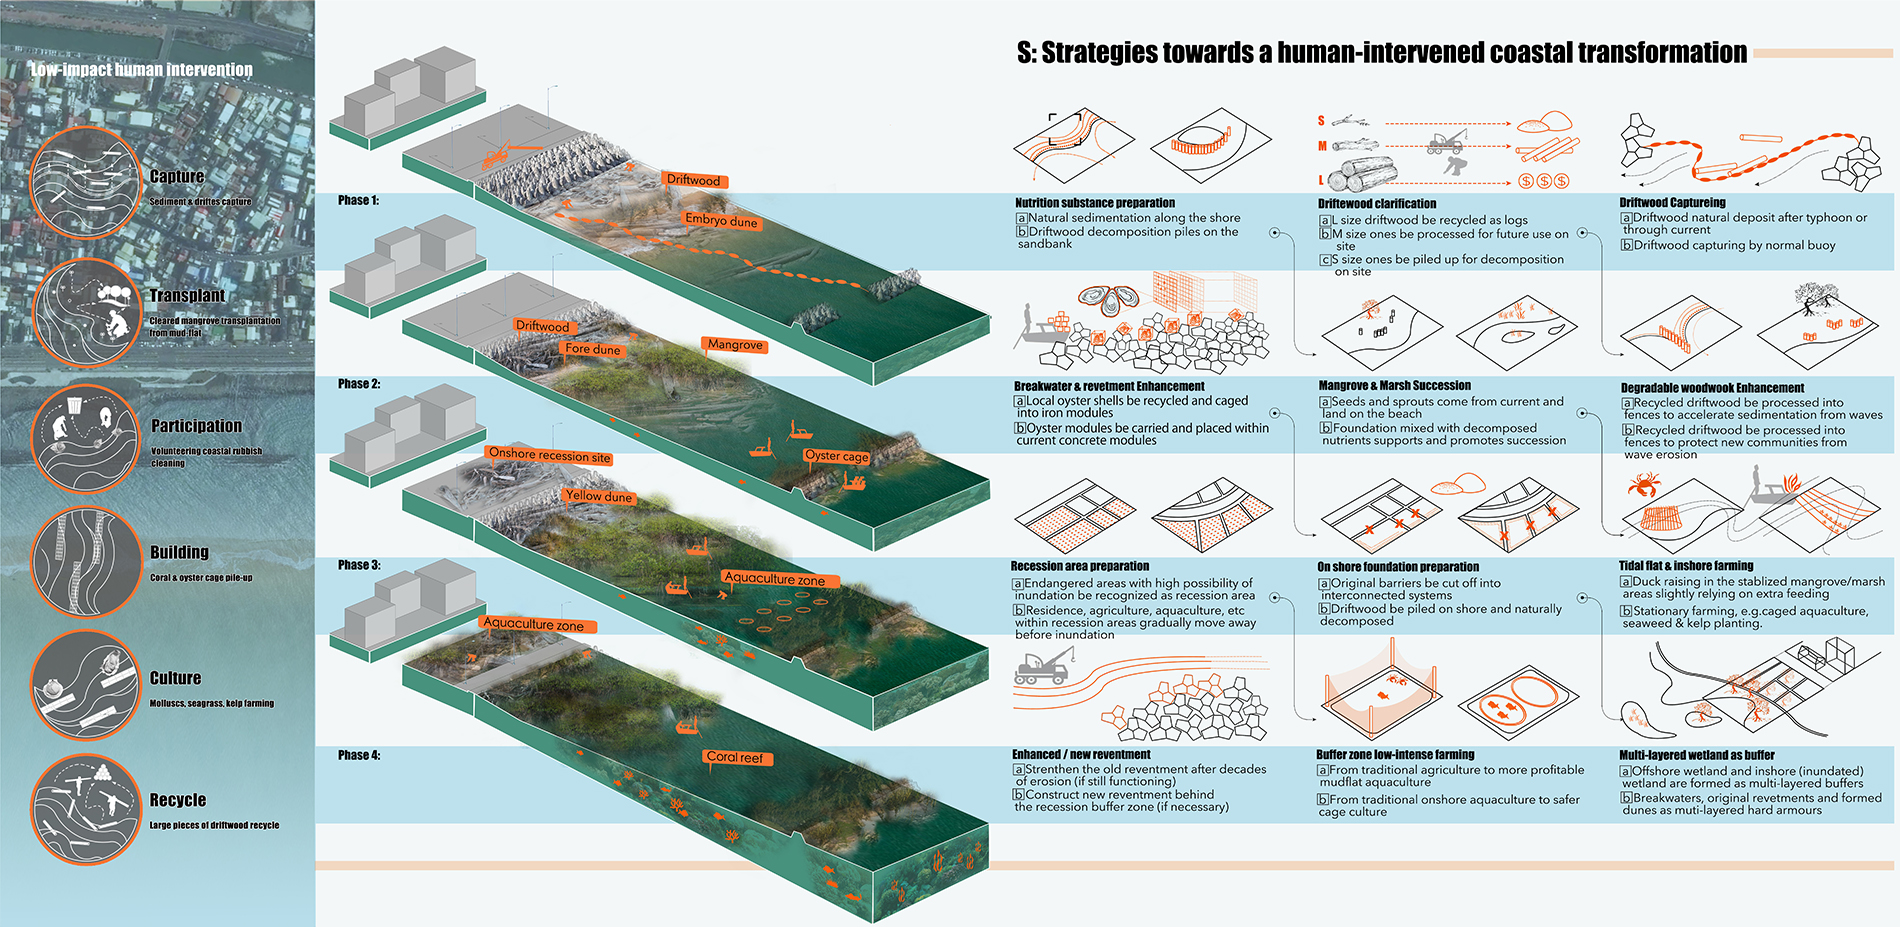 S: Strategies towards a Human-Intervened Coastal Transformation